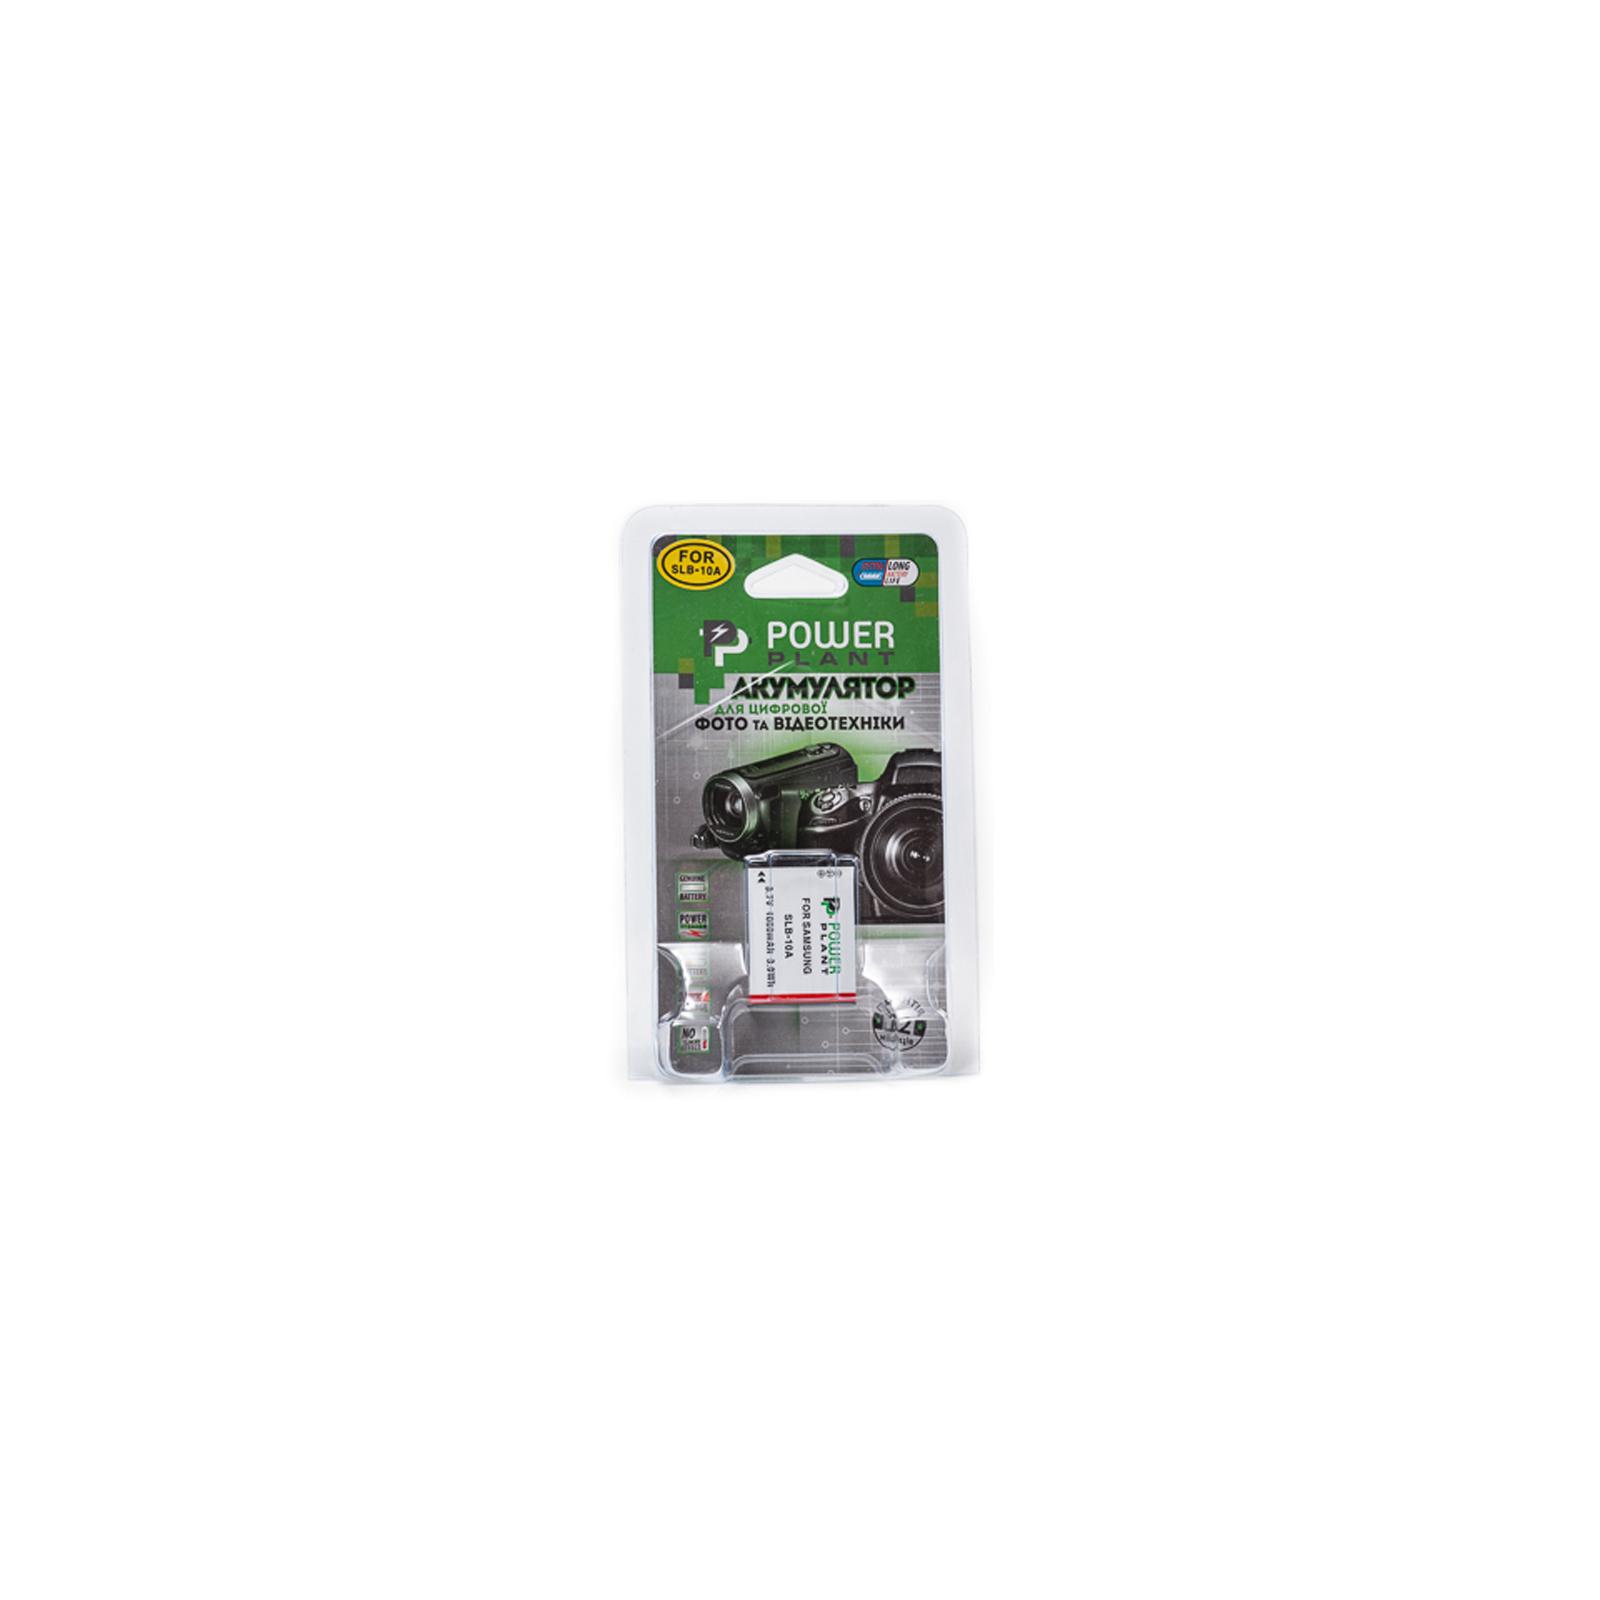 Аккумулятор к фото/видео PowerPlant Samsung SLB-10A (DV00DV1236) изображение 3